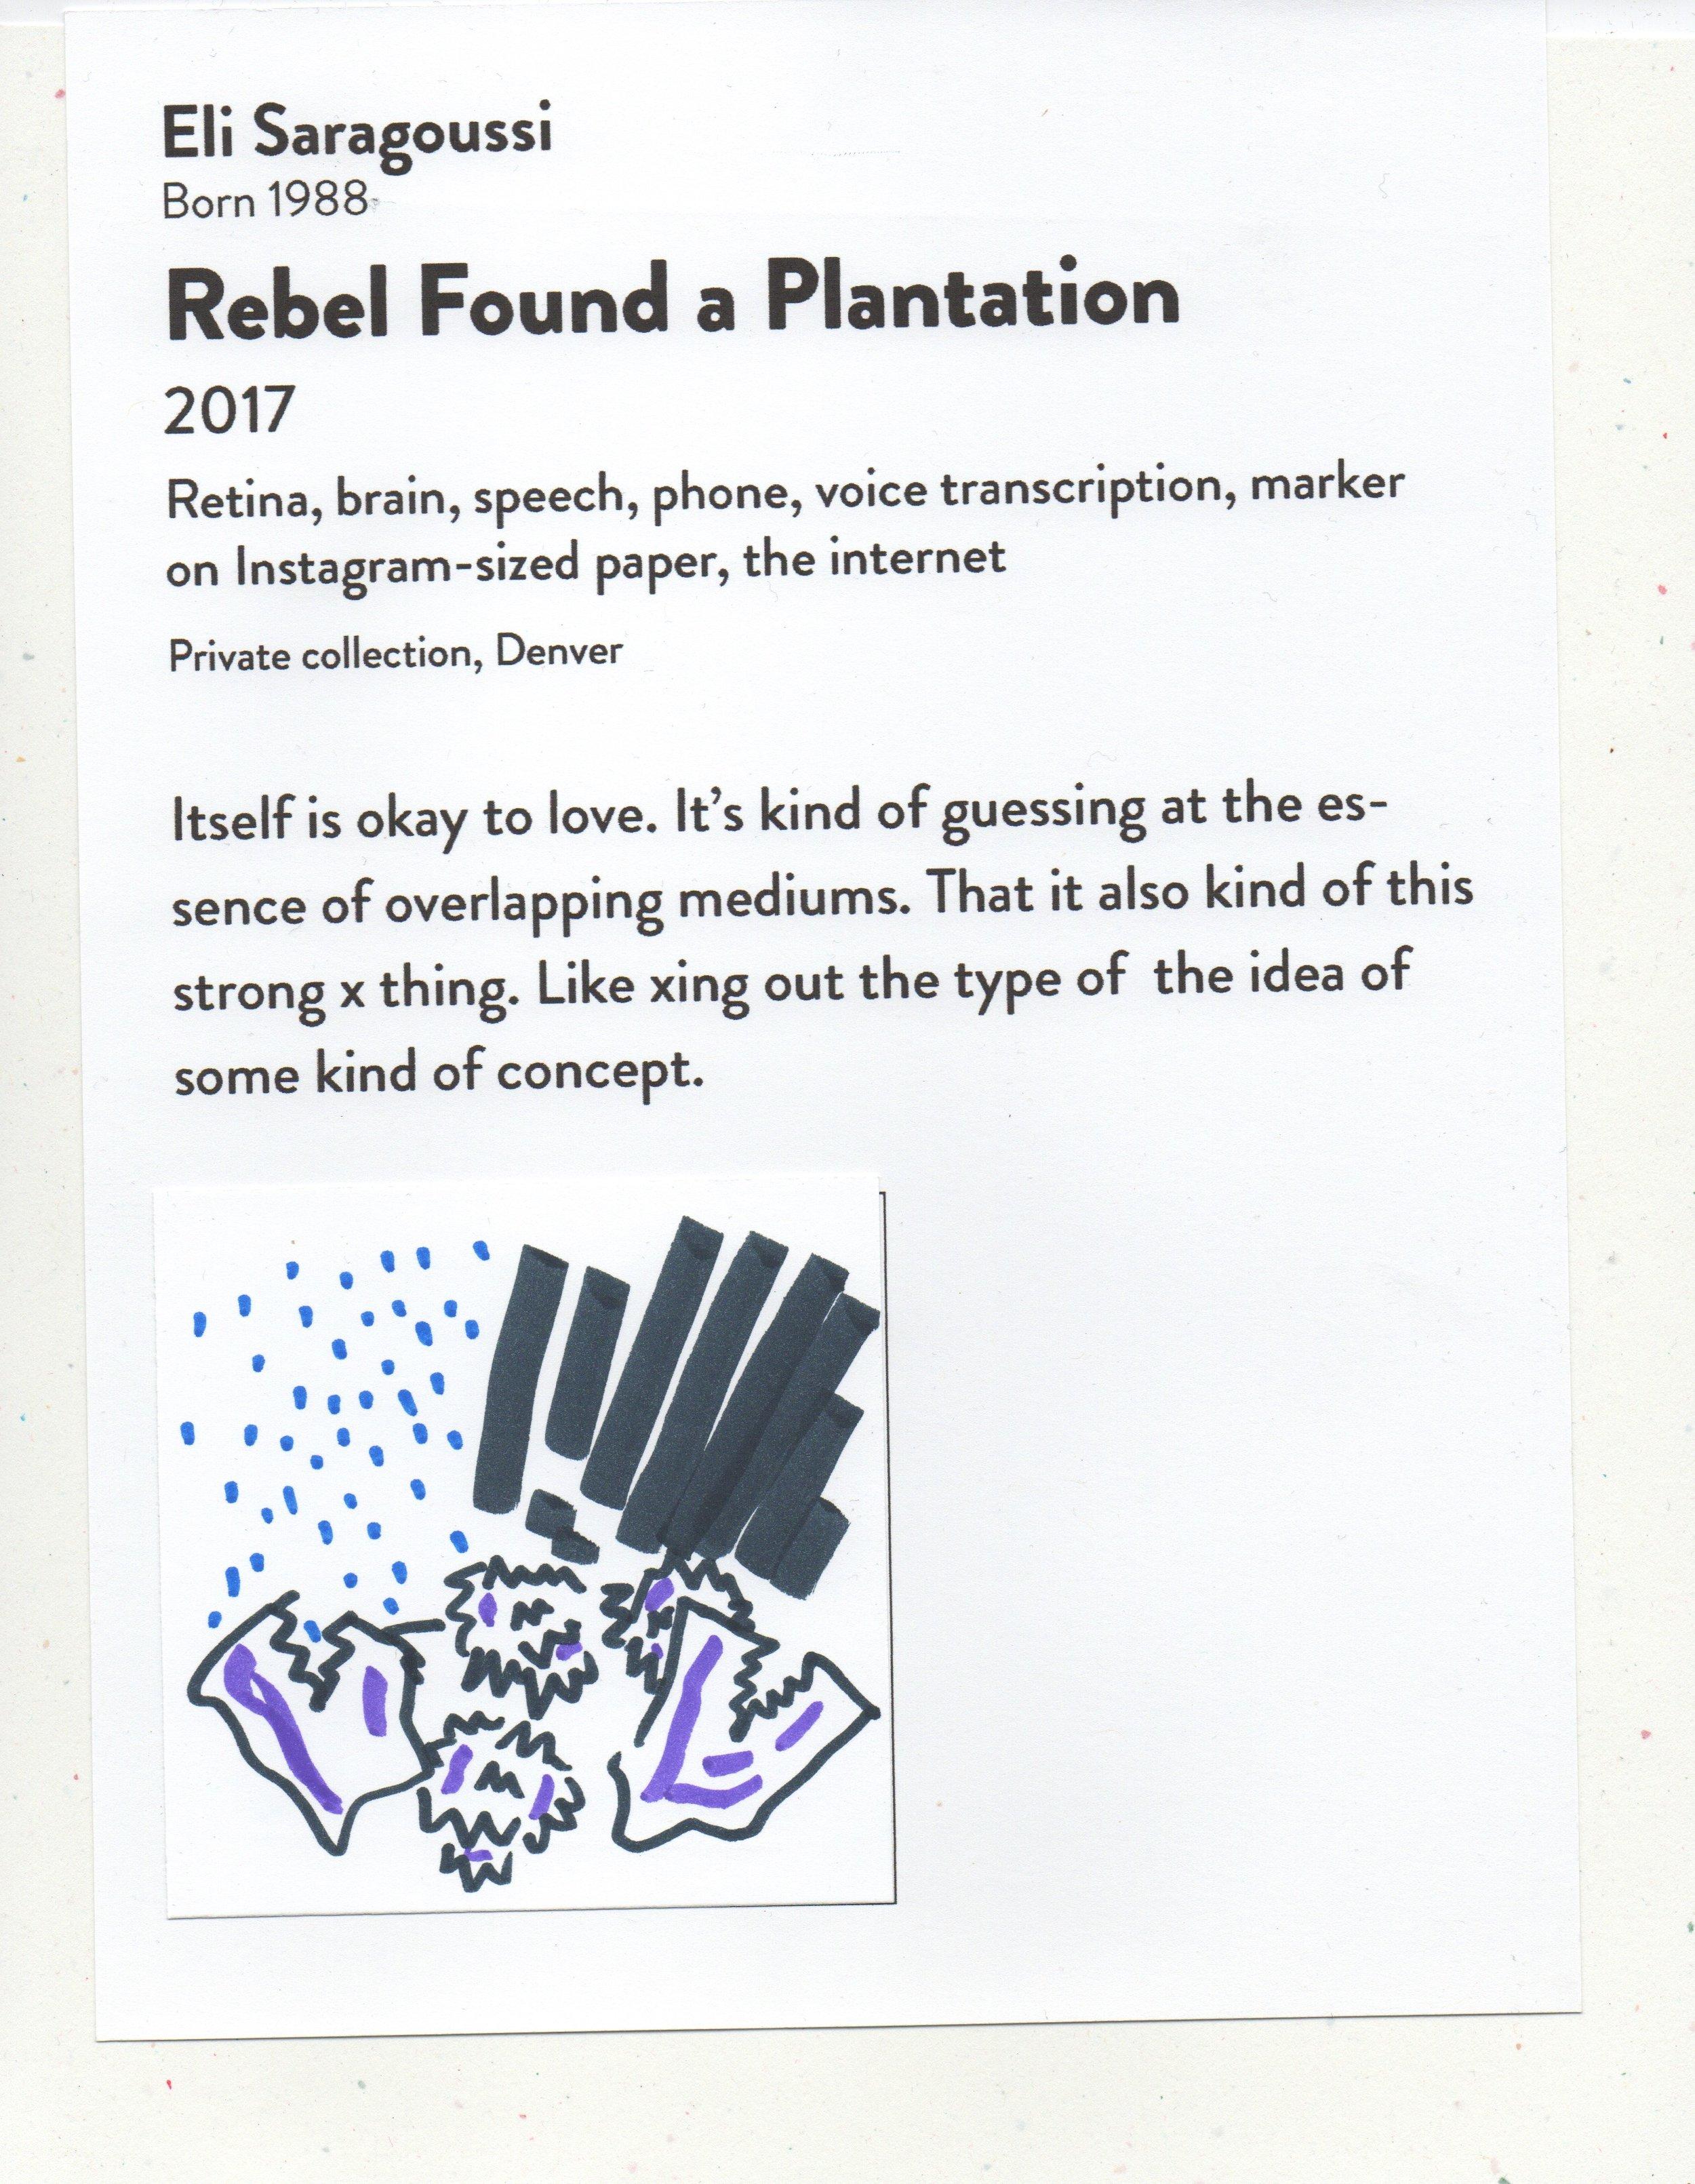 Rebel Found a Plantation DAM Untitled April 28, 2017.jpeg